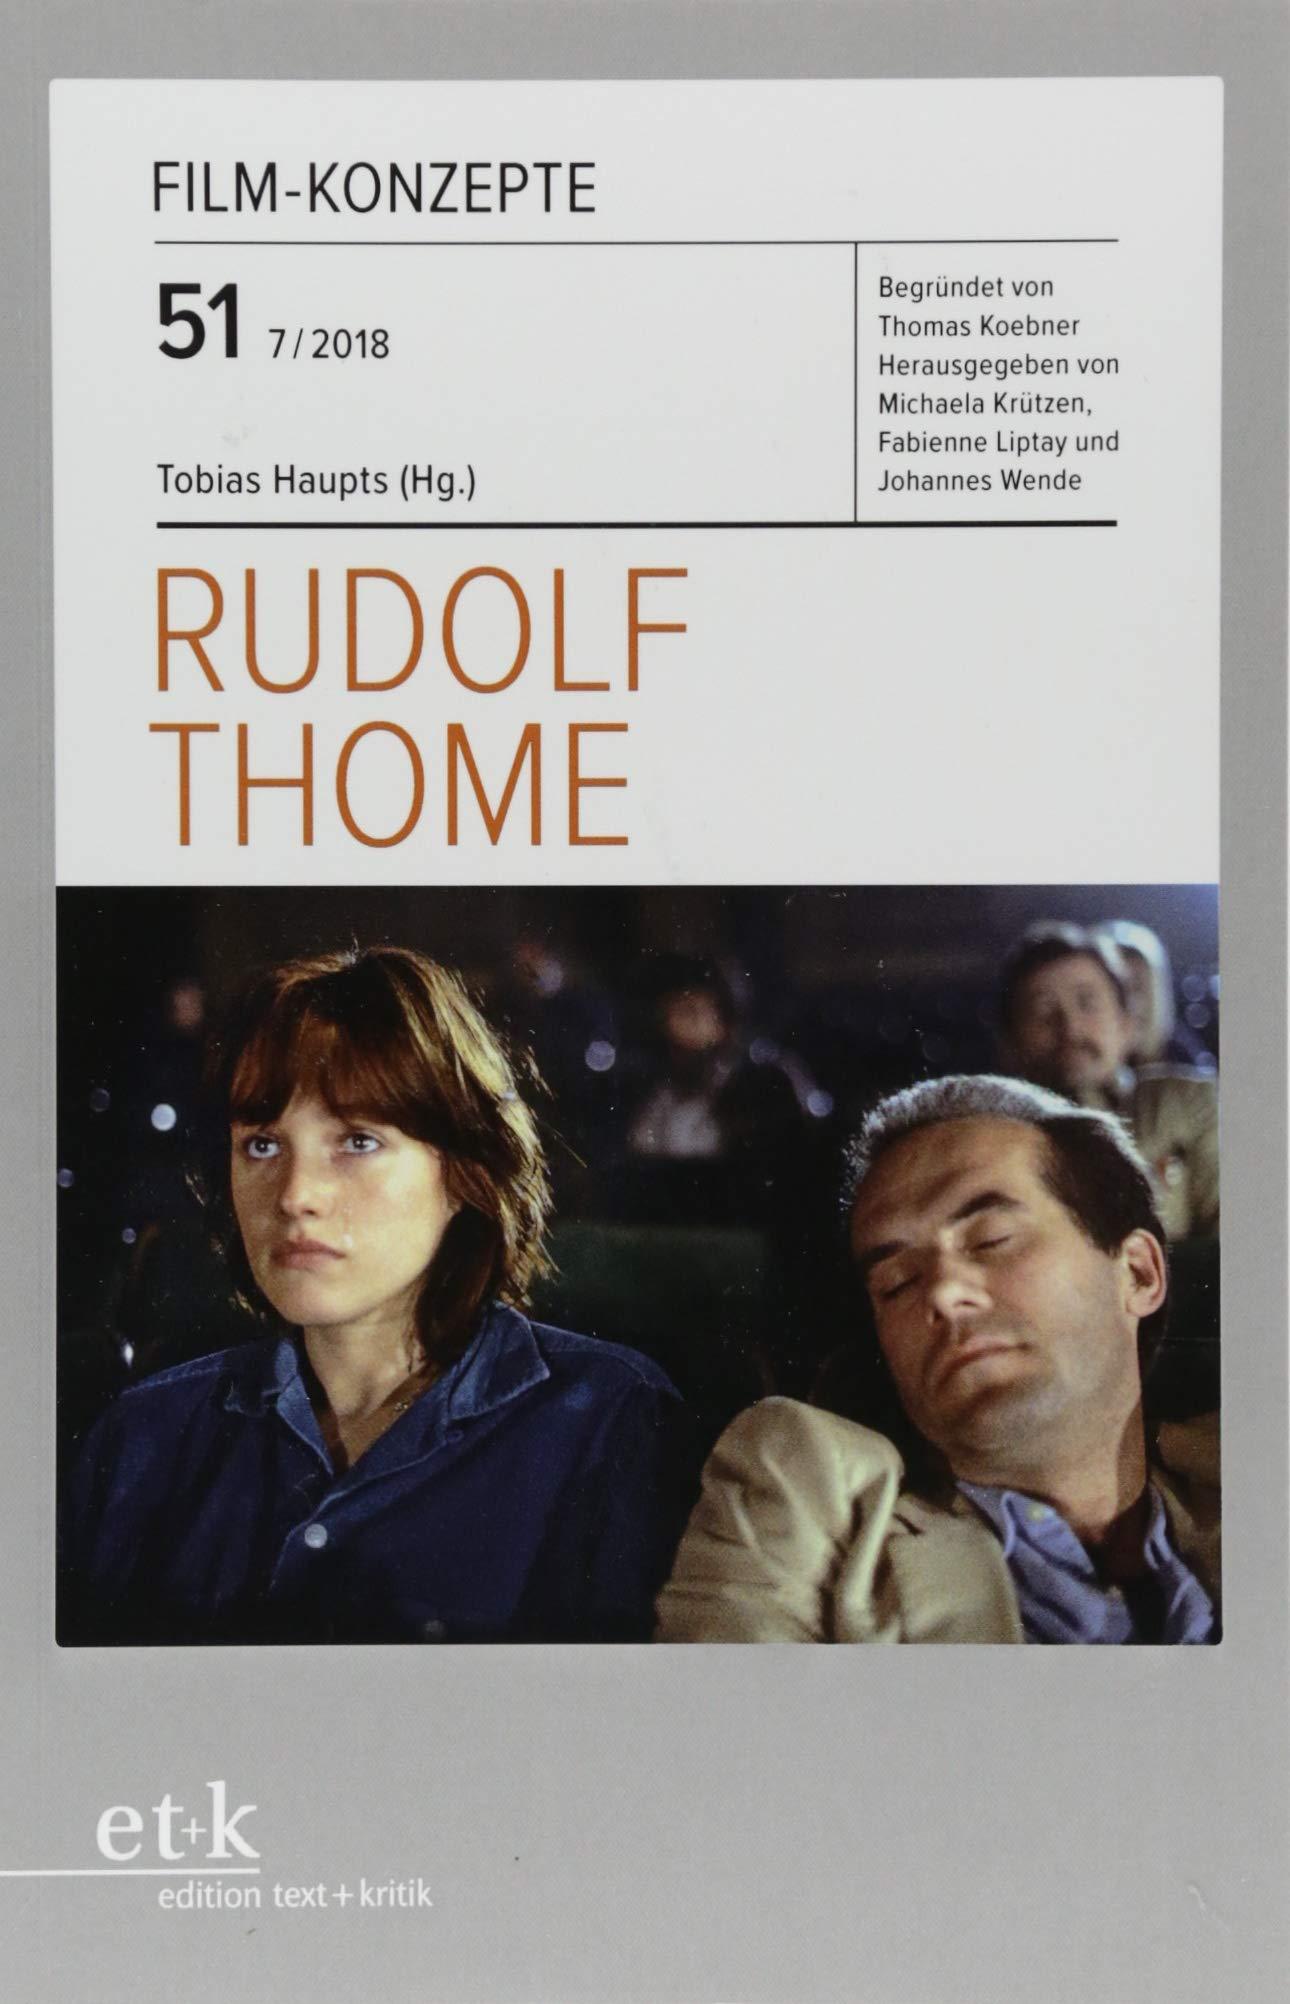 Rudolf Thome (Film-Konzepte) Taschenbuch – 1. Juli 2018 Tobias Haupts Thomas Koebner Michaela Krützen Fabienne Liptay